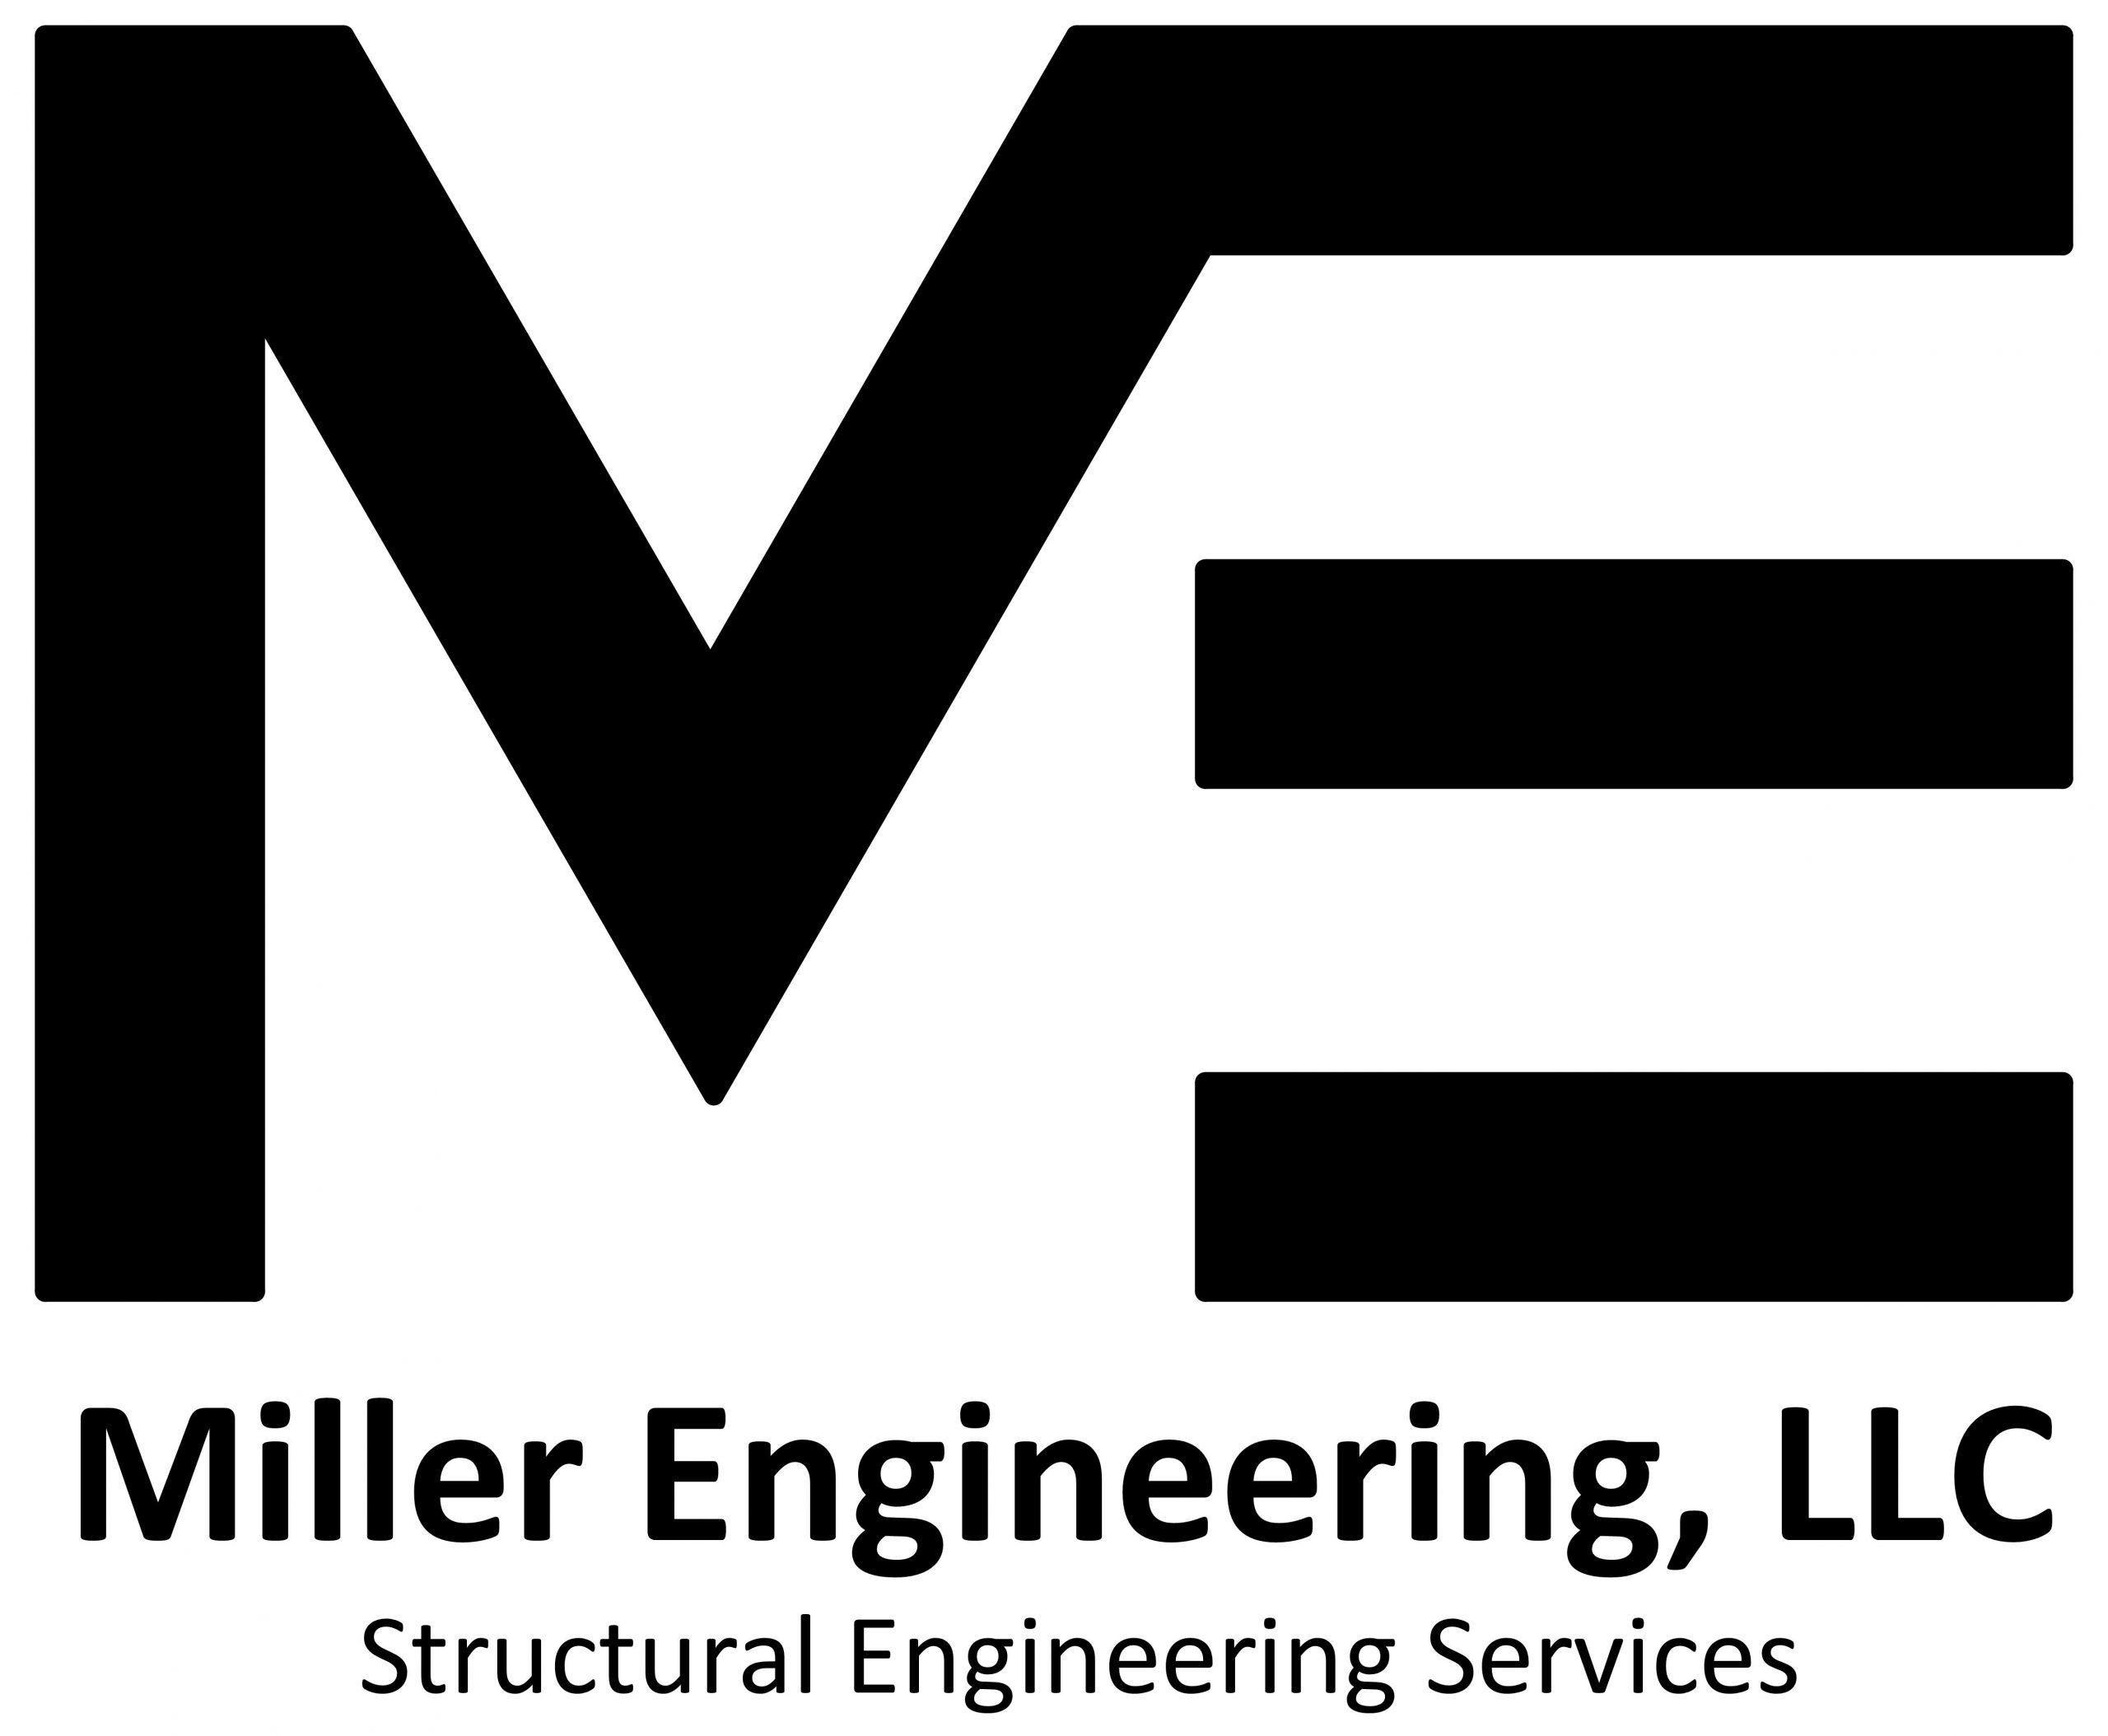 Miller Engineering, LLC